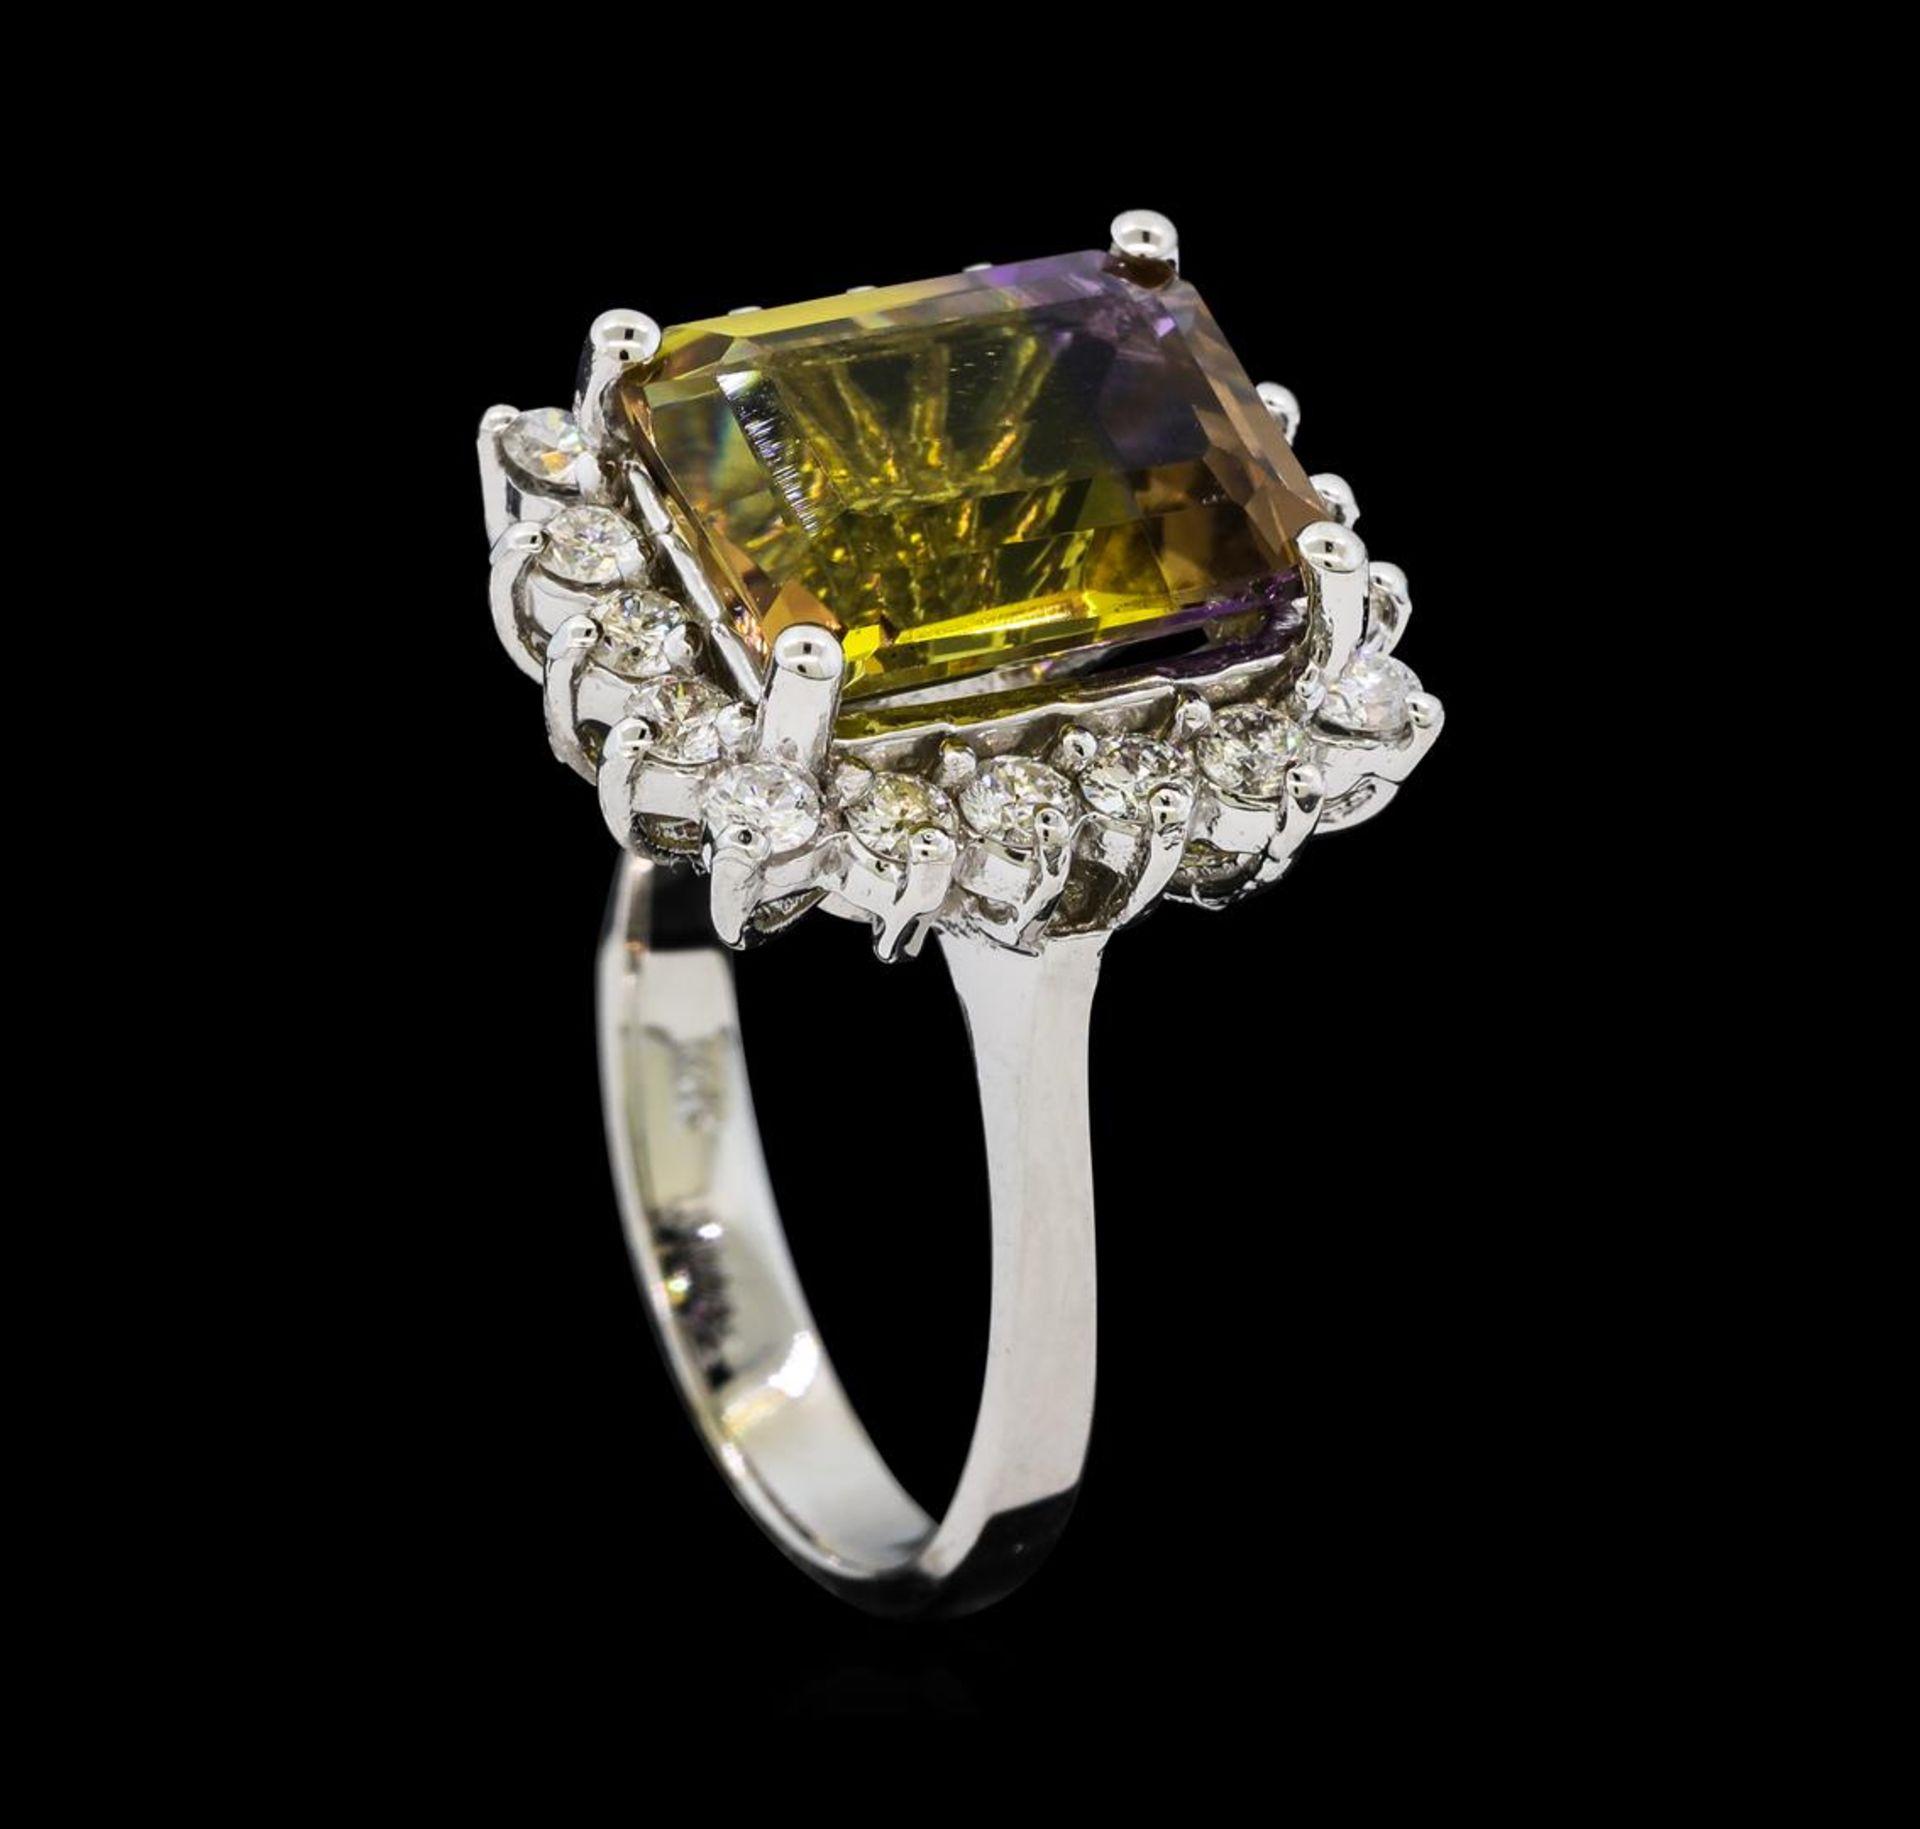 4.62 ctw Ametrine Quartz and Diamond Ring - 14KT White Gold - Image 4 of 4